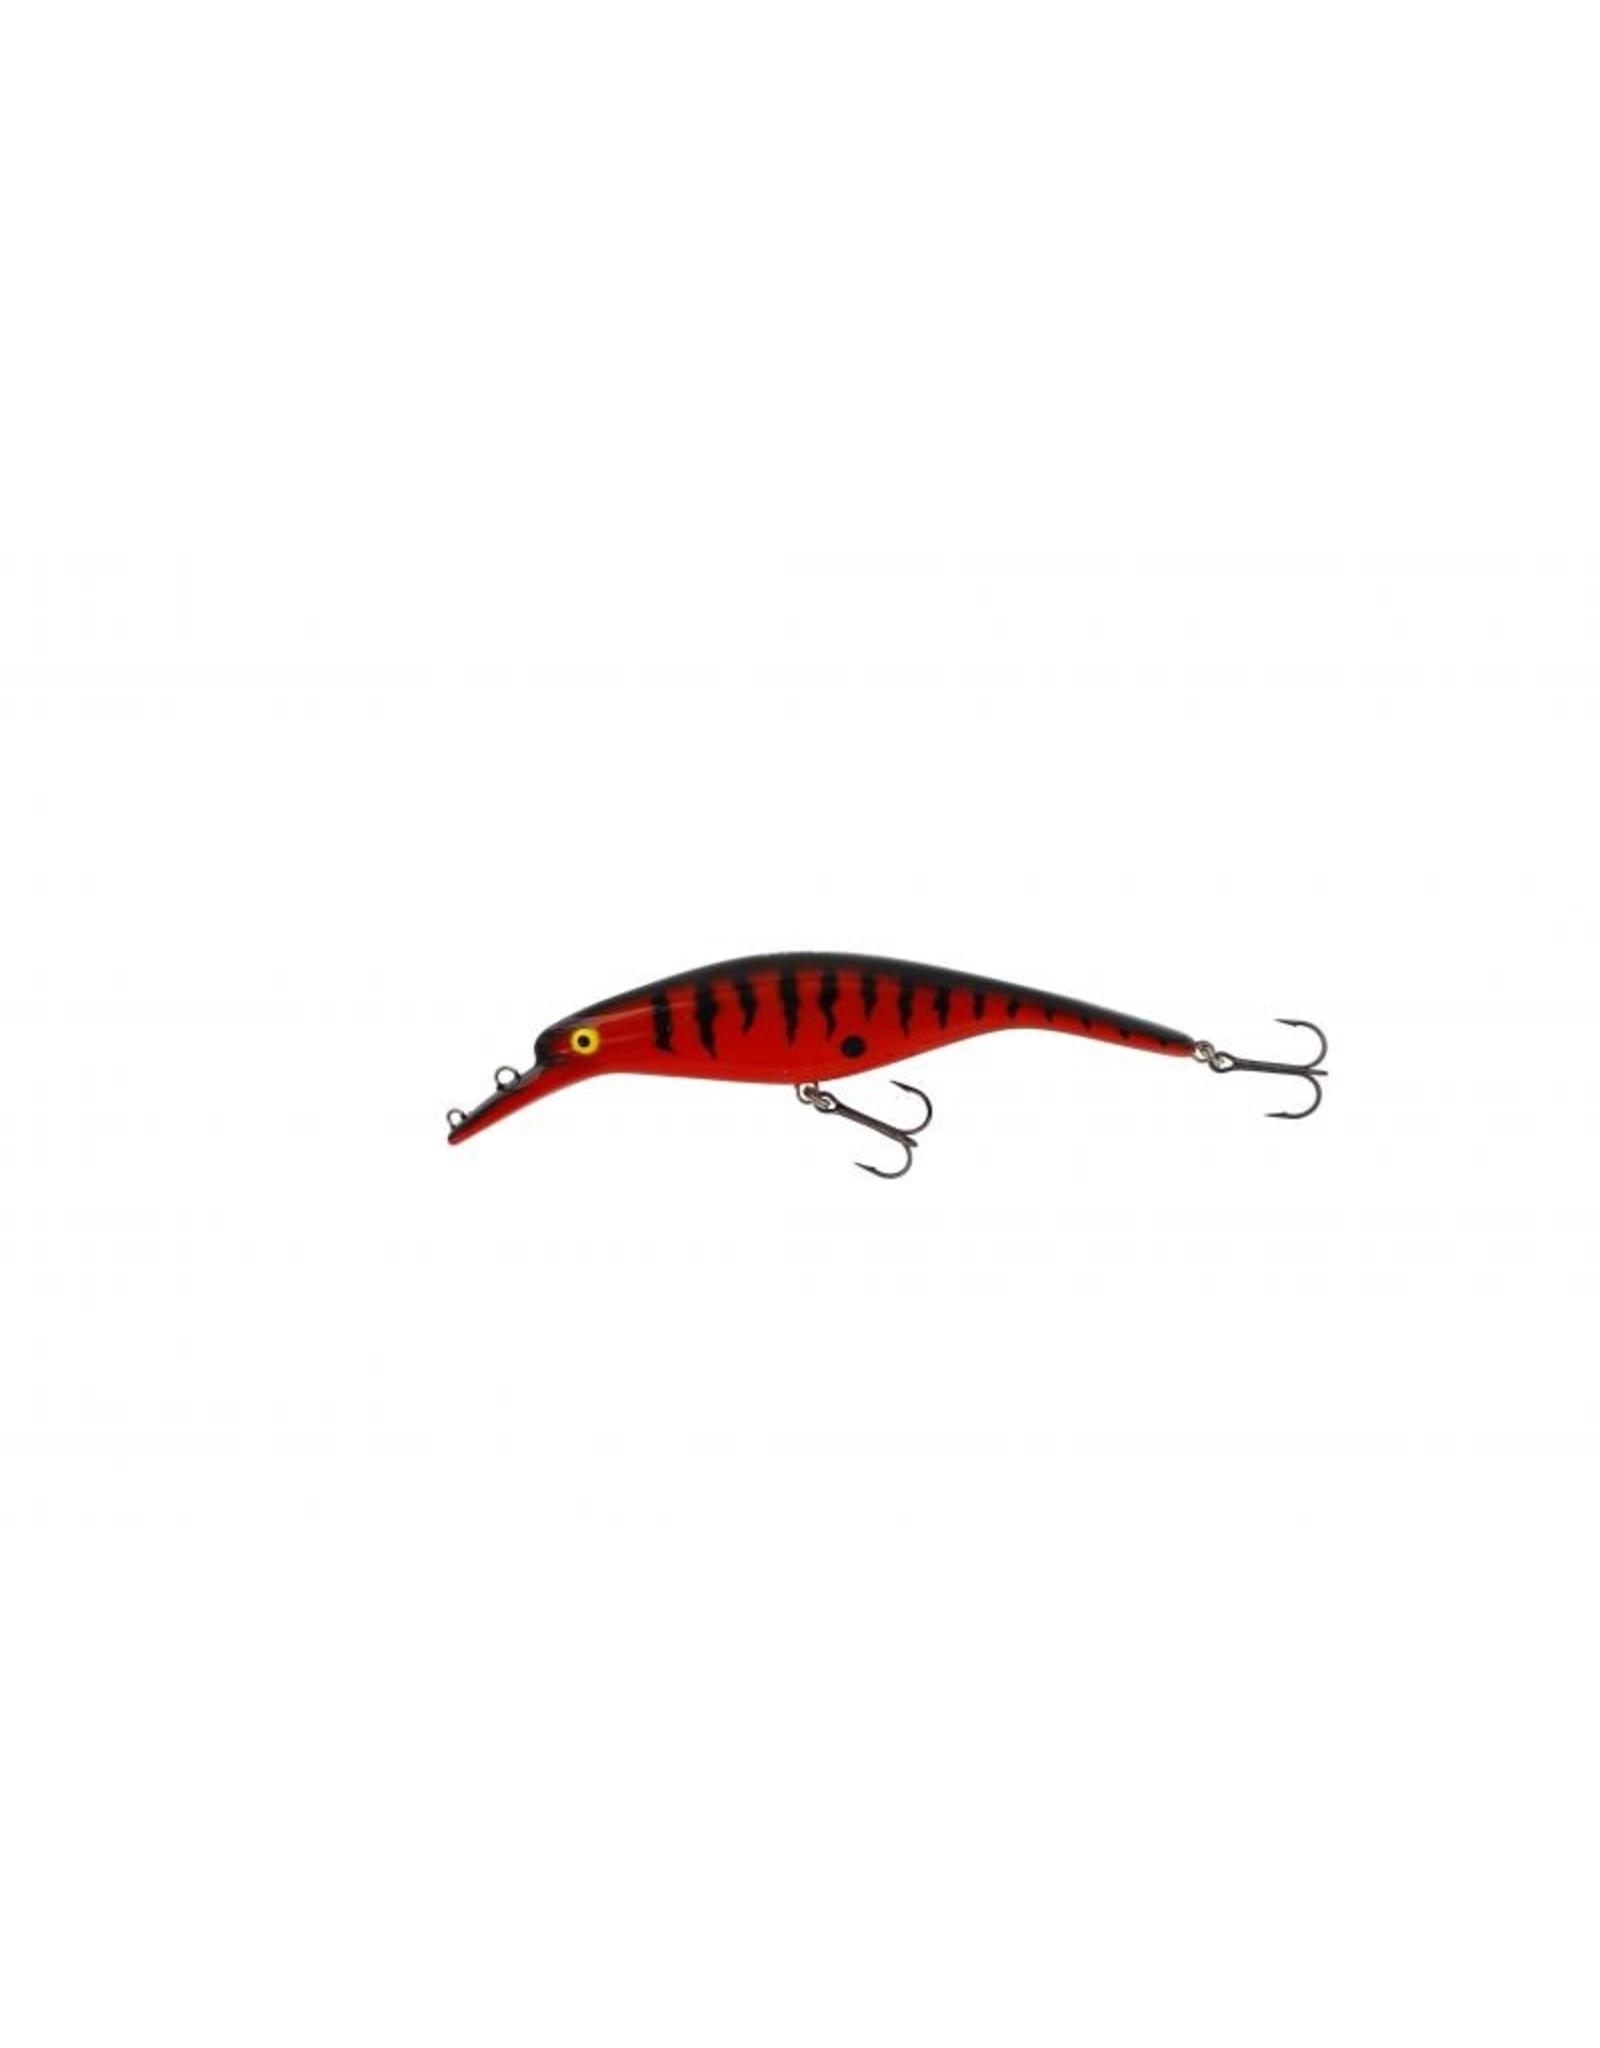 Westin Westin Platypus 90mm 10g  red tiger